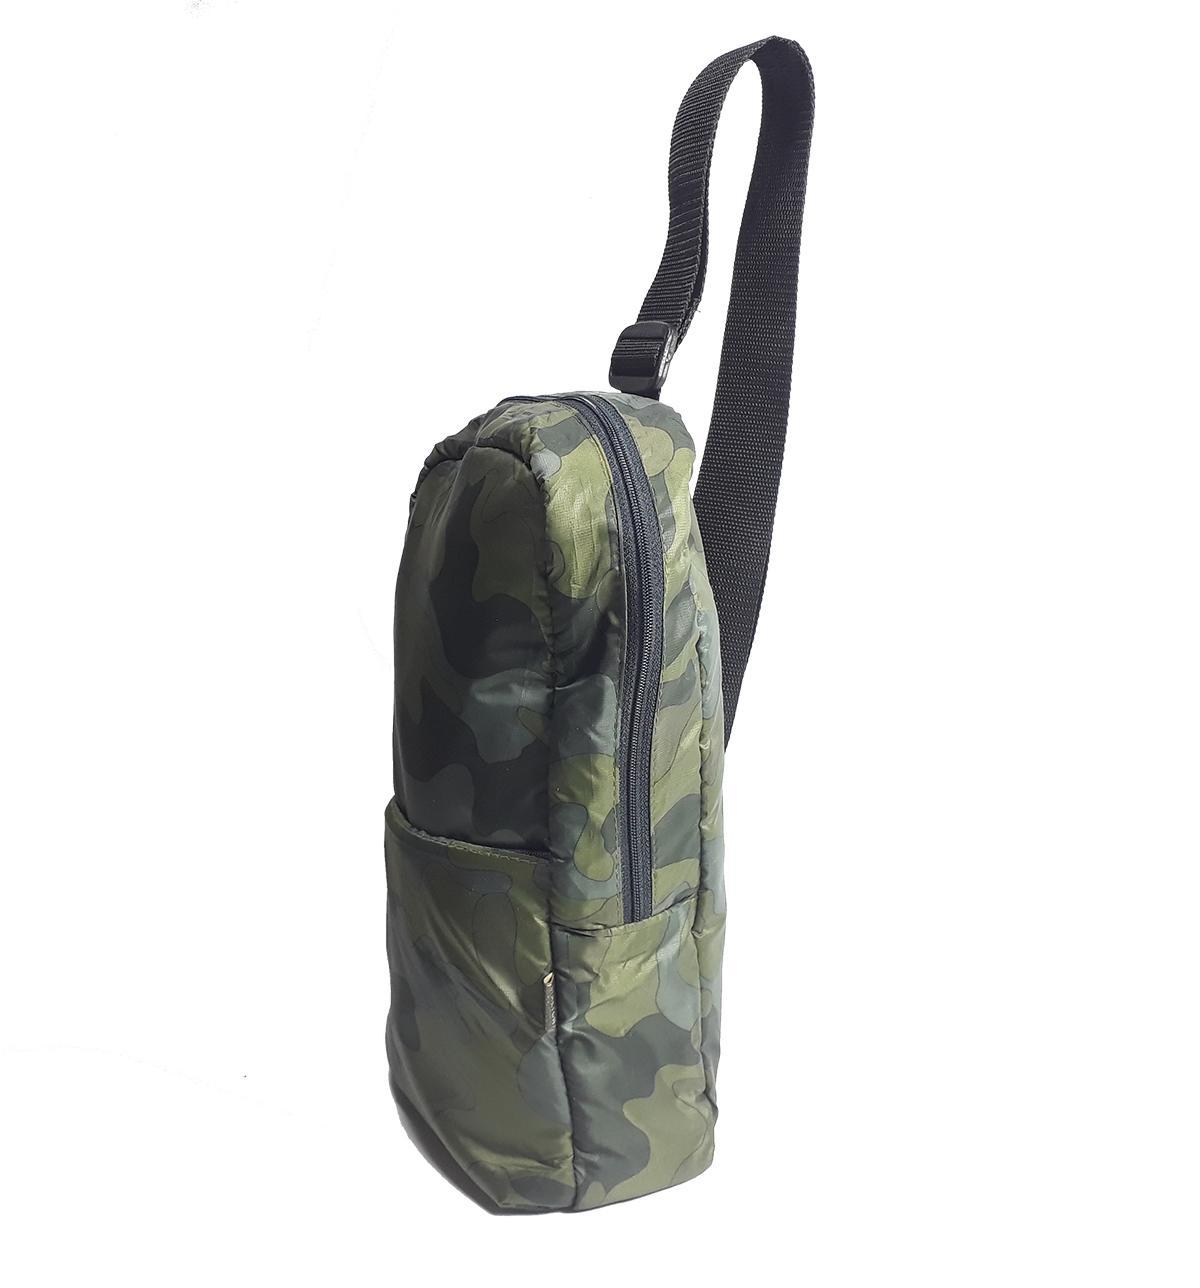 Detail Gambar Tas Slempang BAPE Sling Bag Army - Tas Slempang Sling Bag Army Casual Terbaru